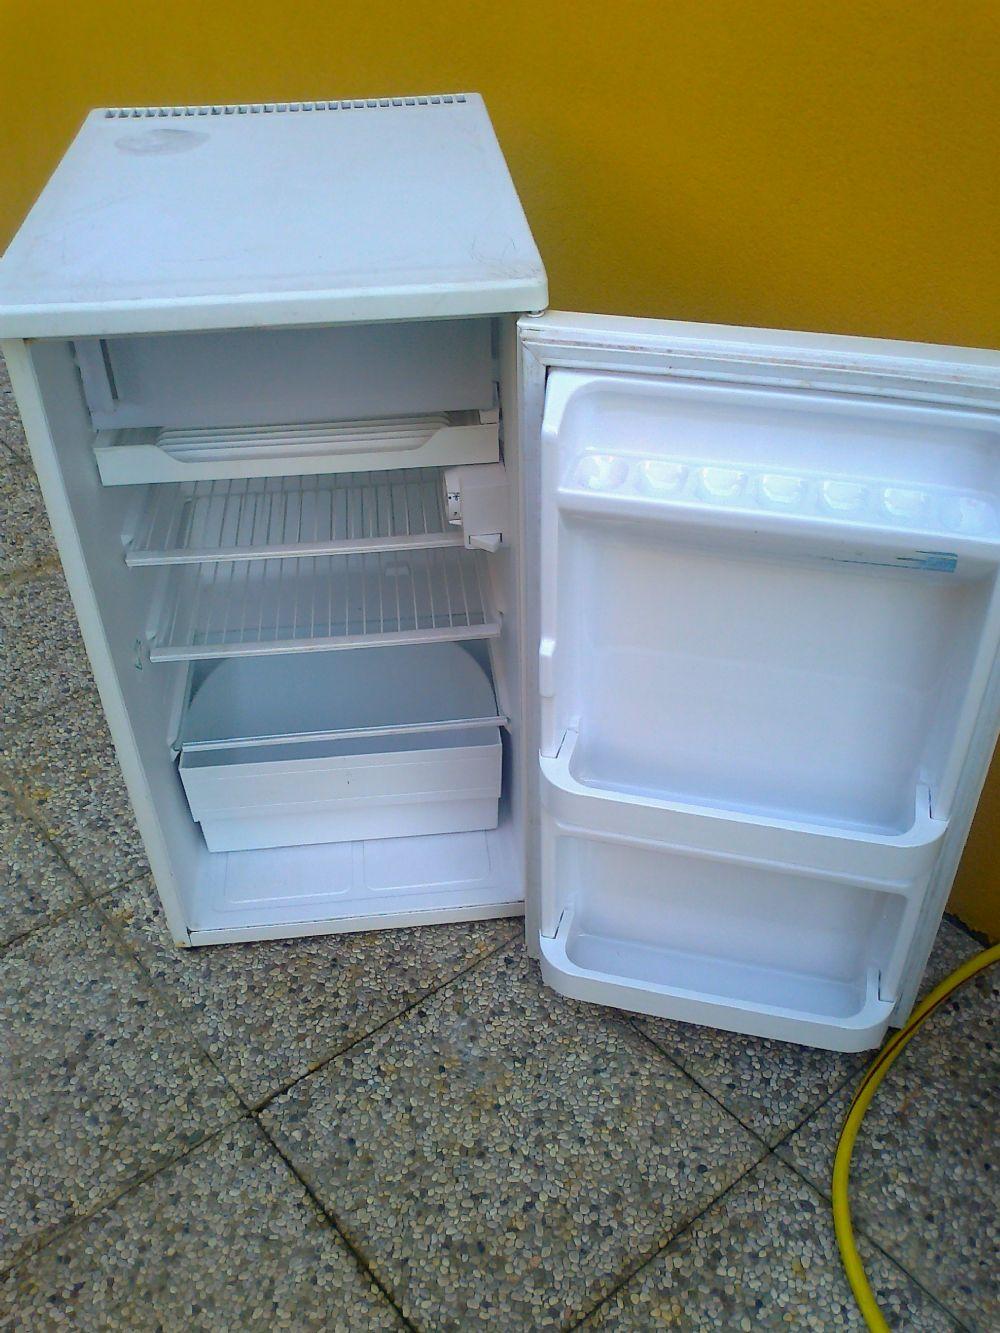 Baratto scambio frigorifero arredamento esterno a for Arredamento esterno usato